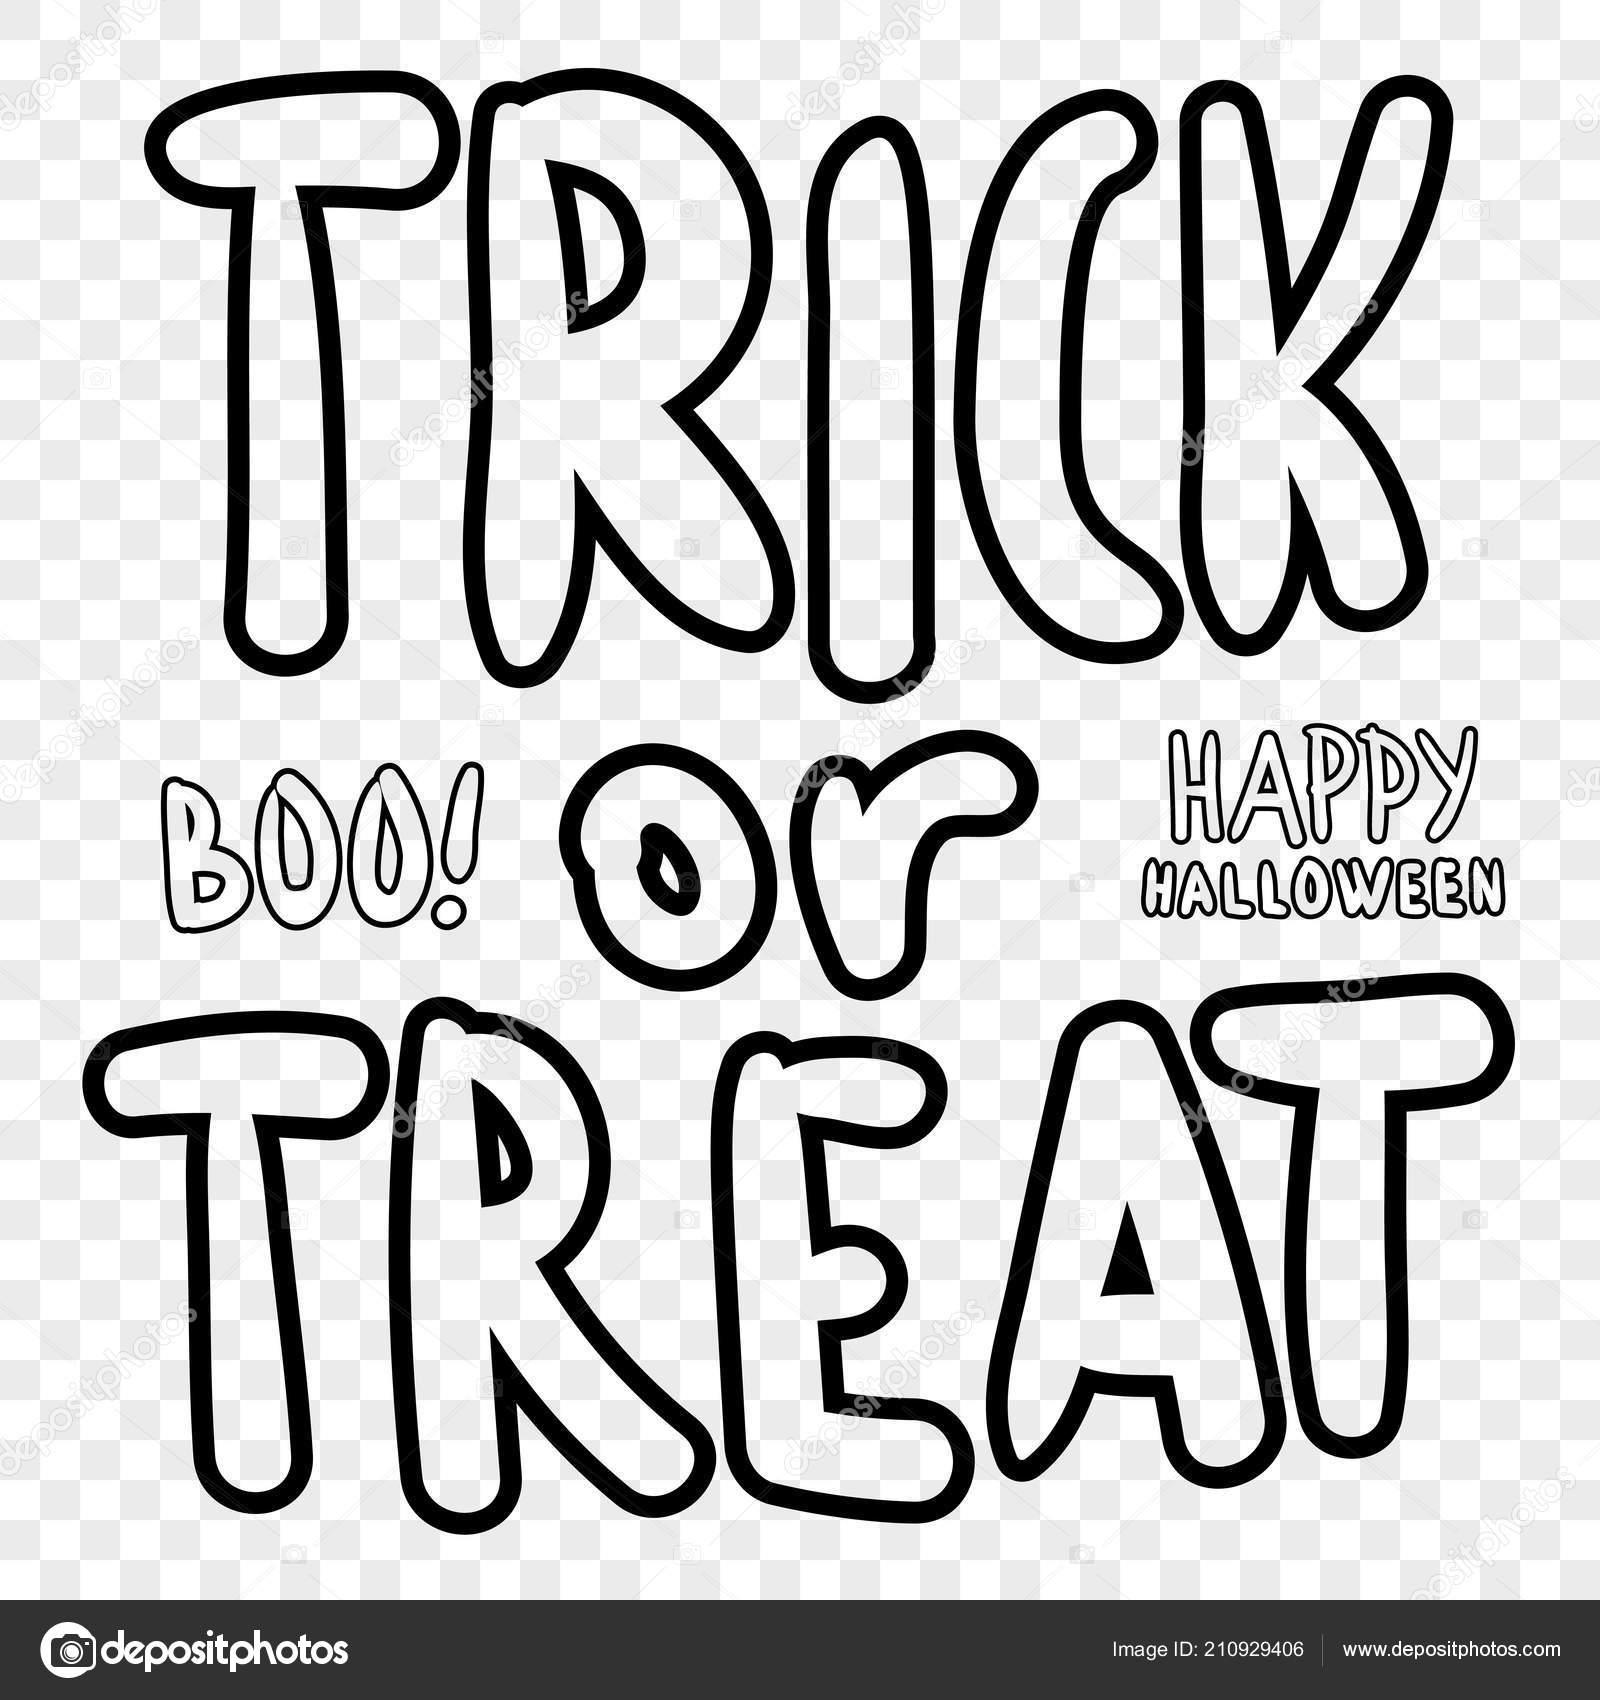 Trick Treat Halloween Digital Stamp Laser Cutting Templates ...